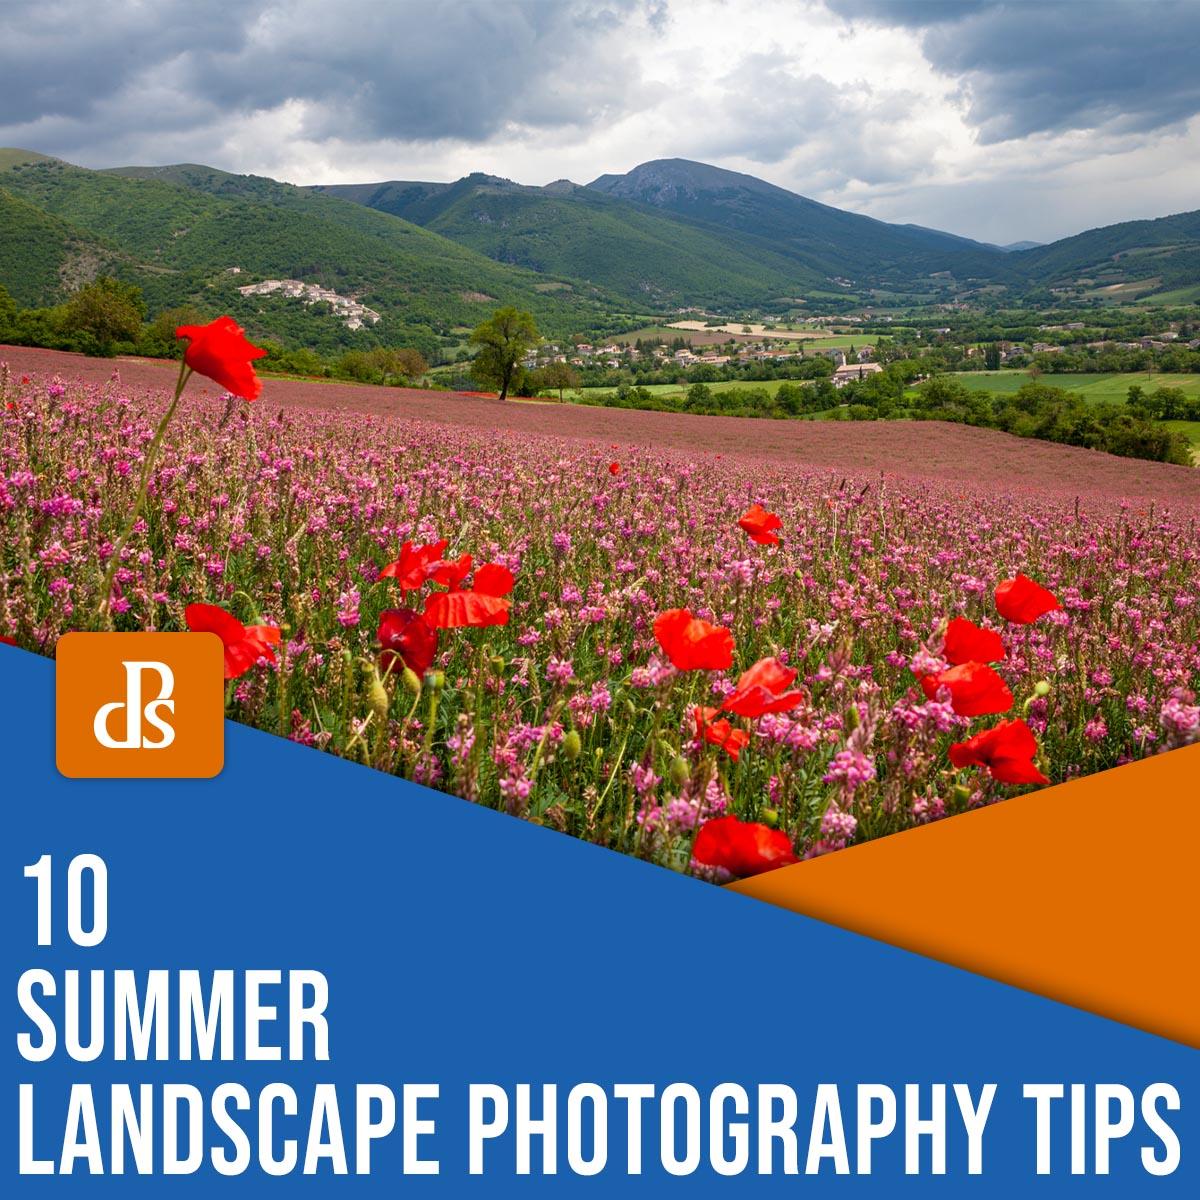 10 summer landscape photography tips